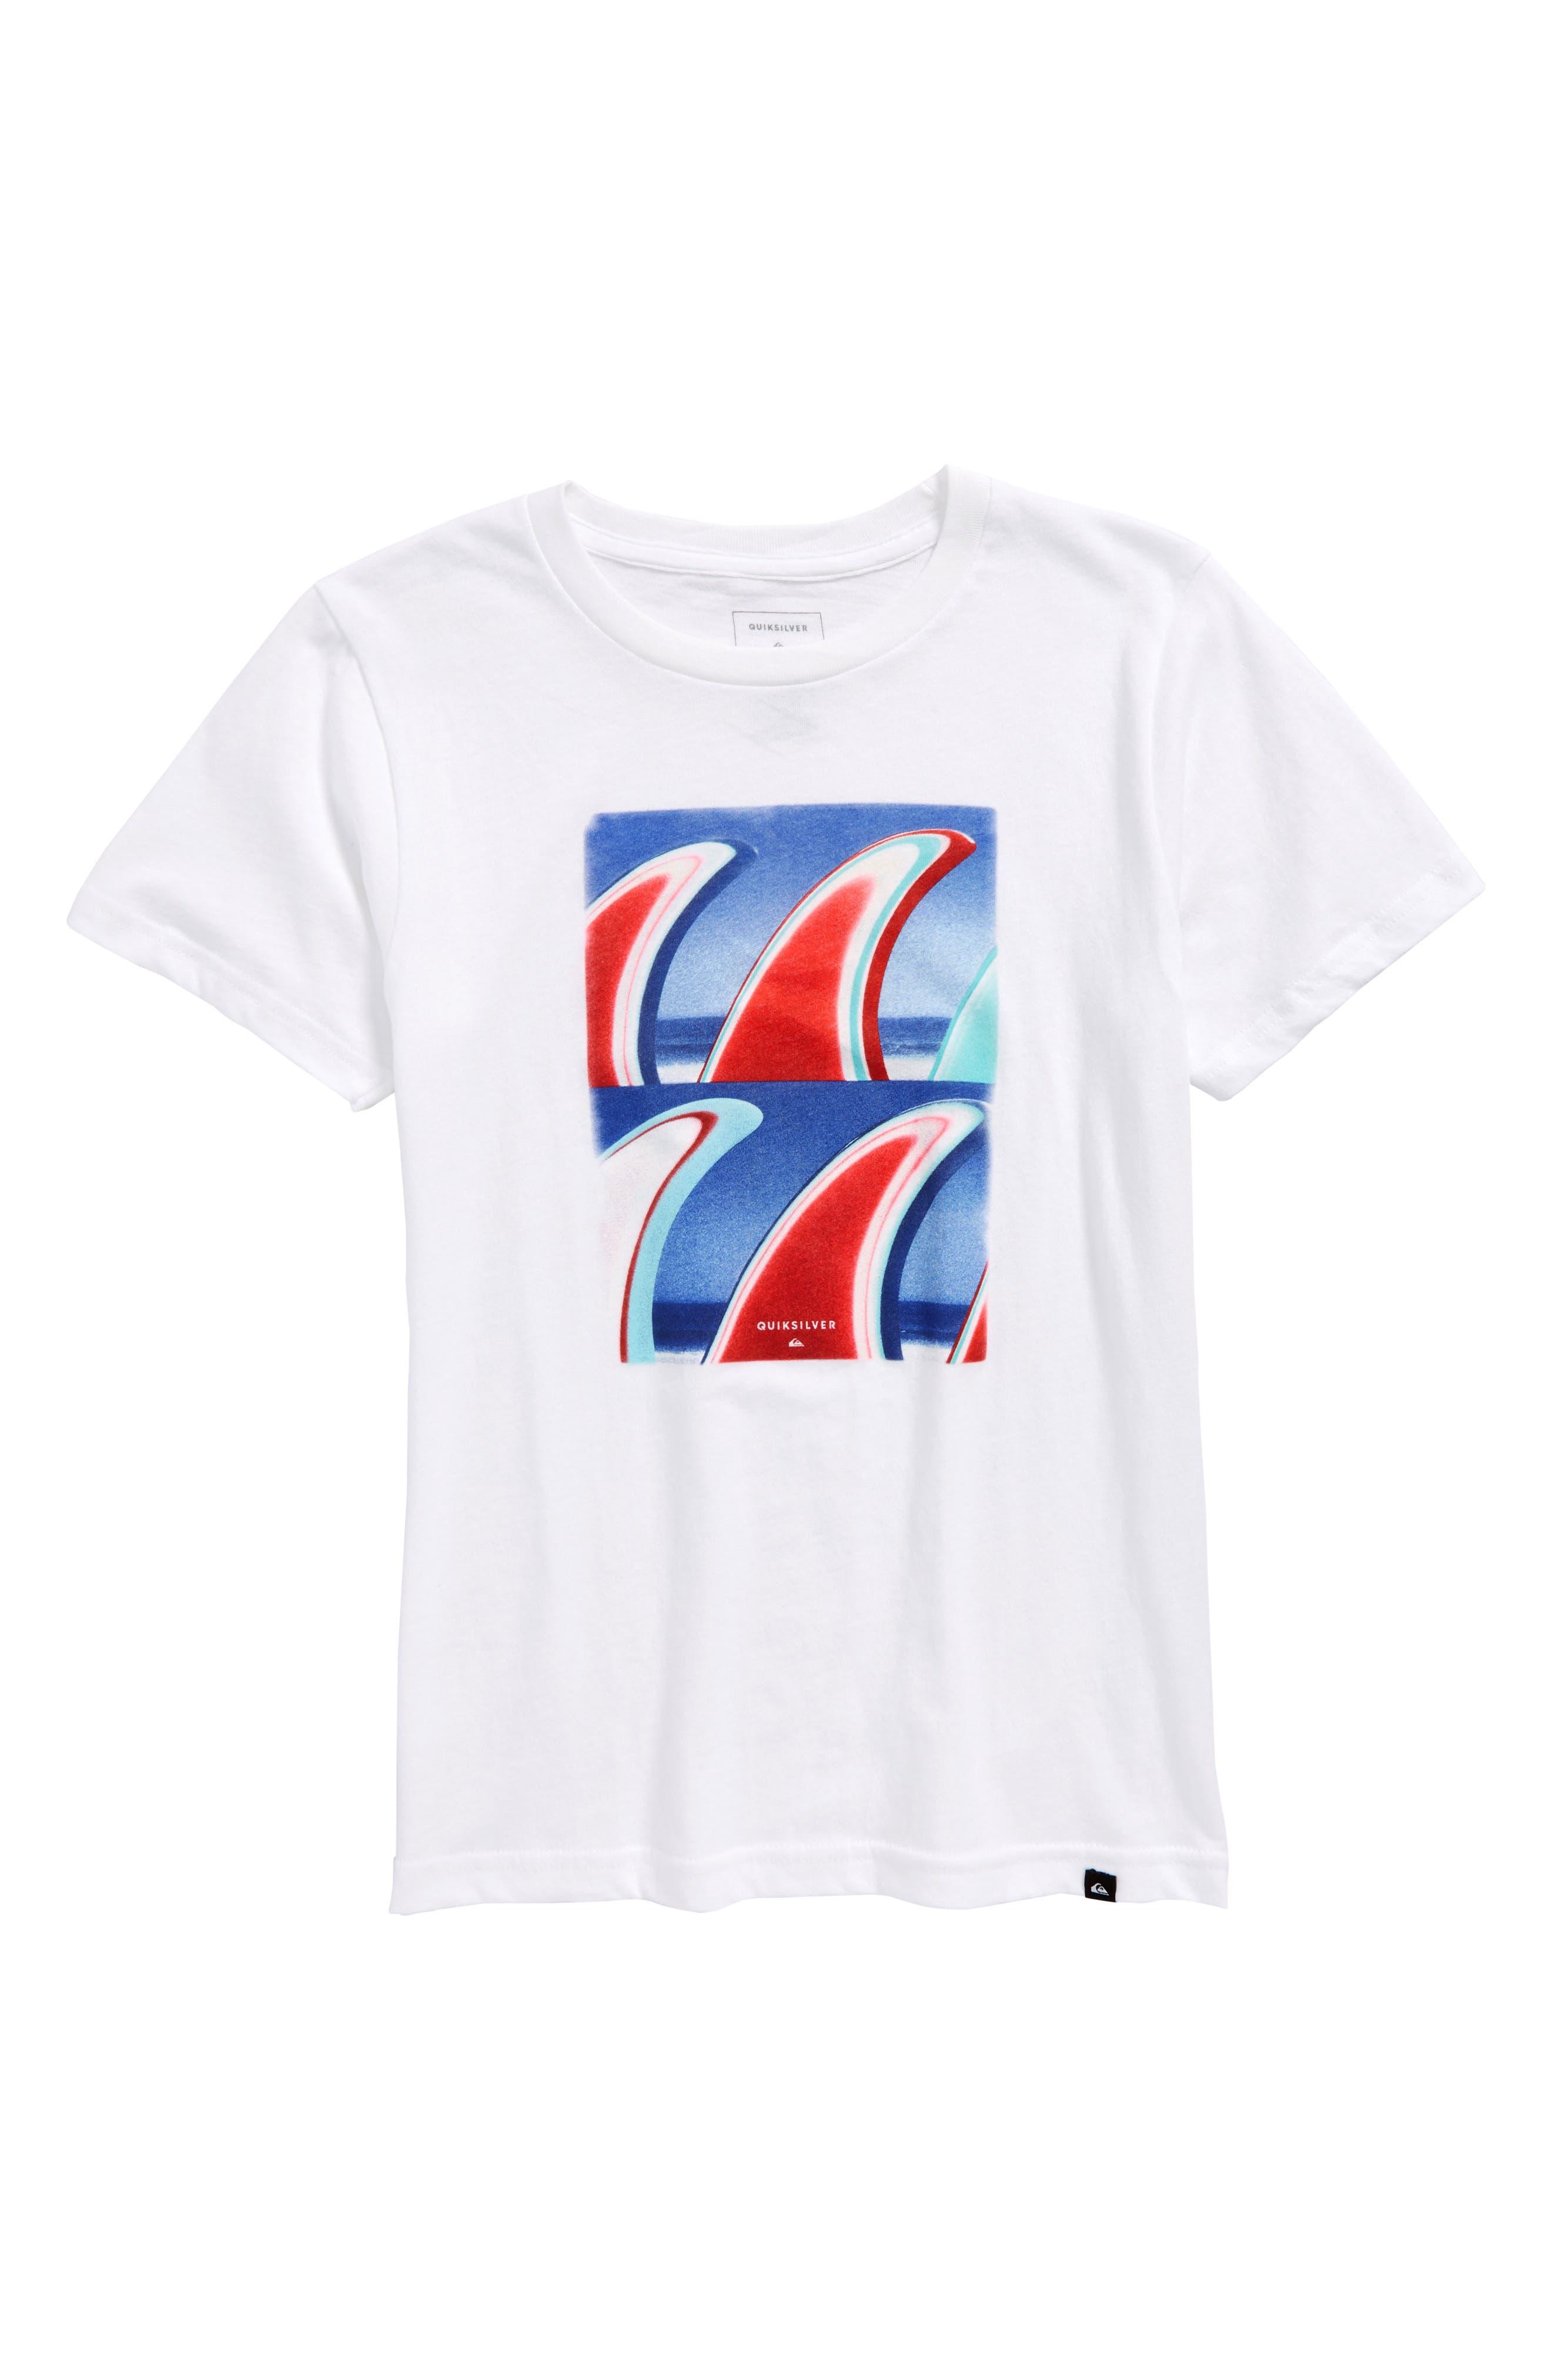 Fin Finatic Graphic T-Shirt,                             Main thumbnail 1, color,                             White